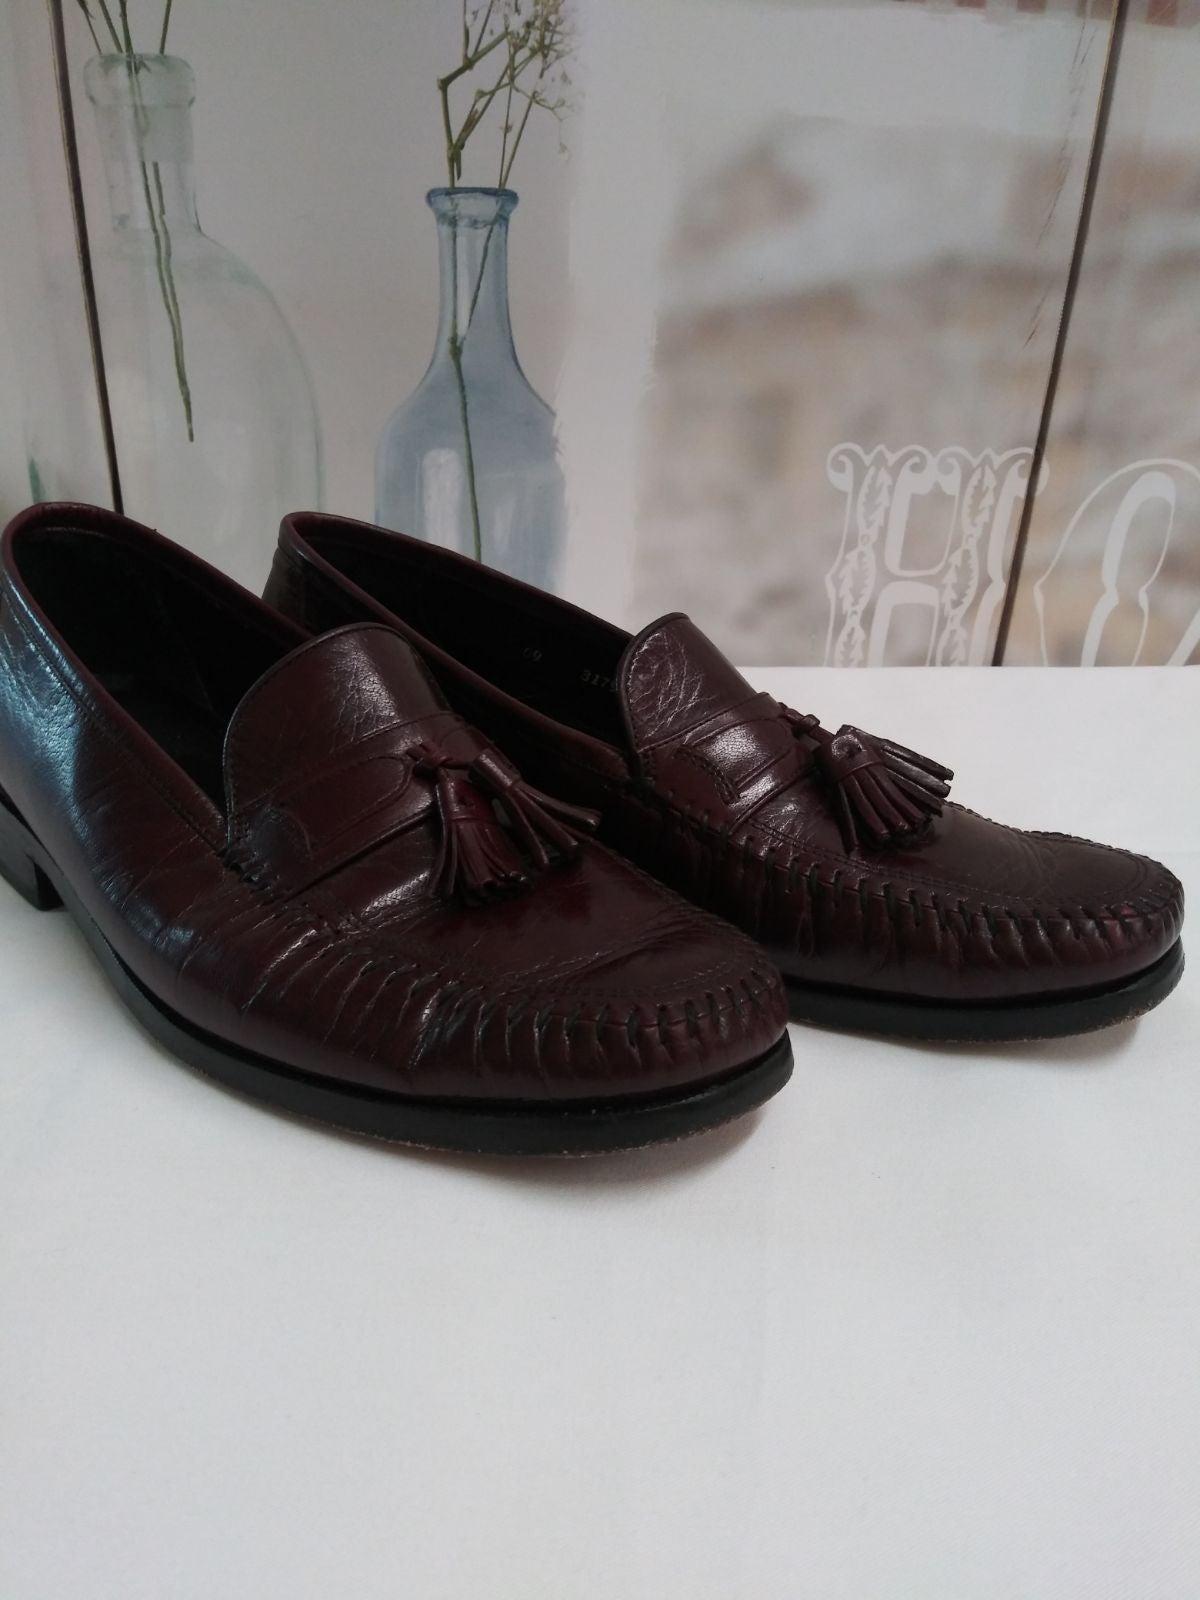 Florheim Loafers Sz. 9M